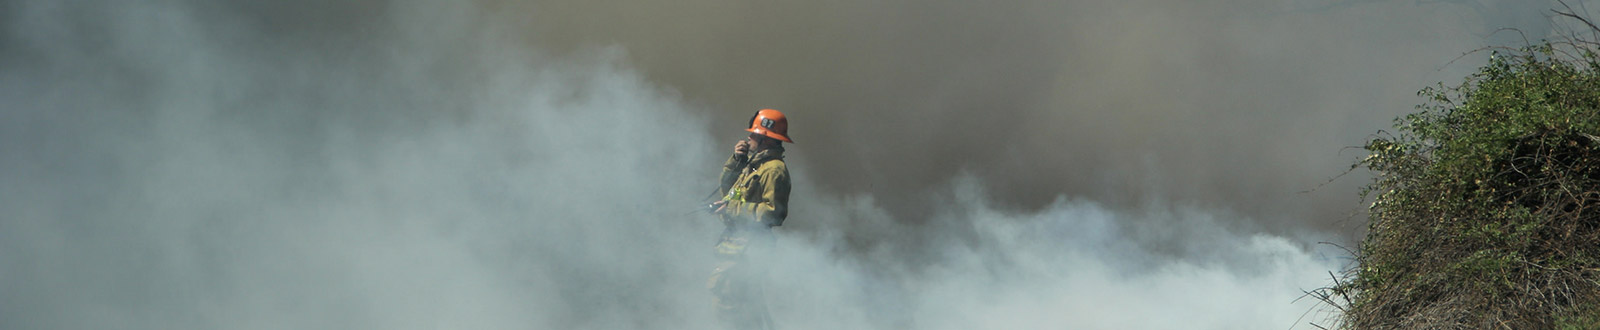 Firefighter standing in smoke